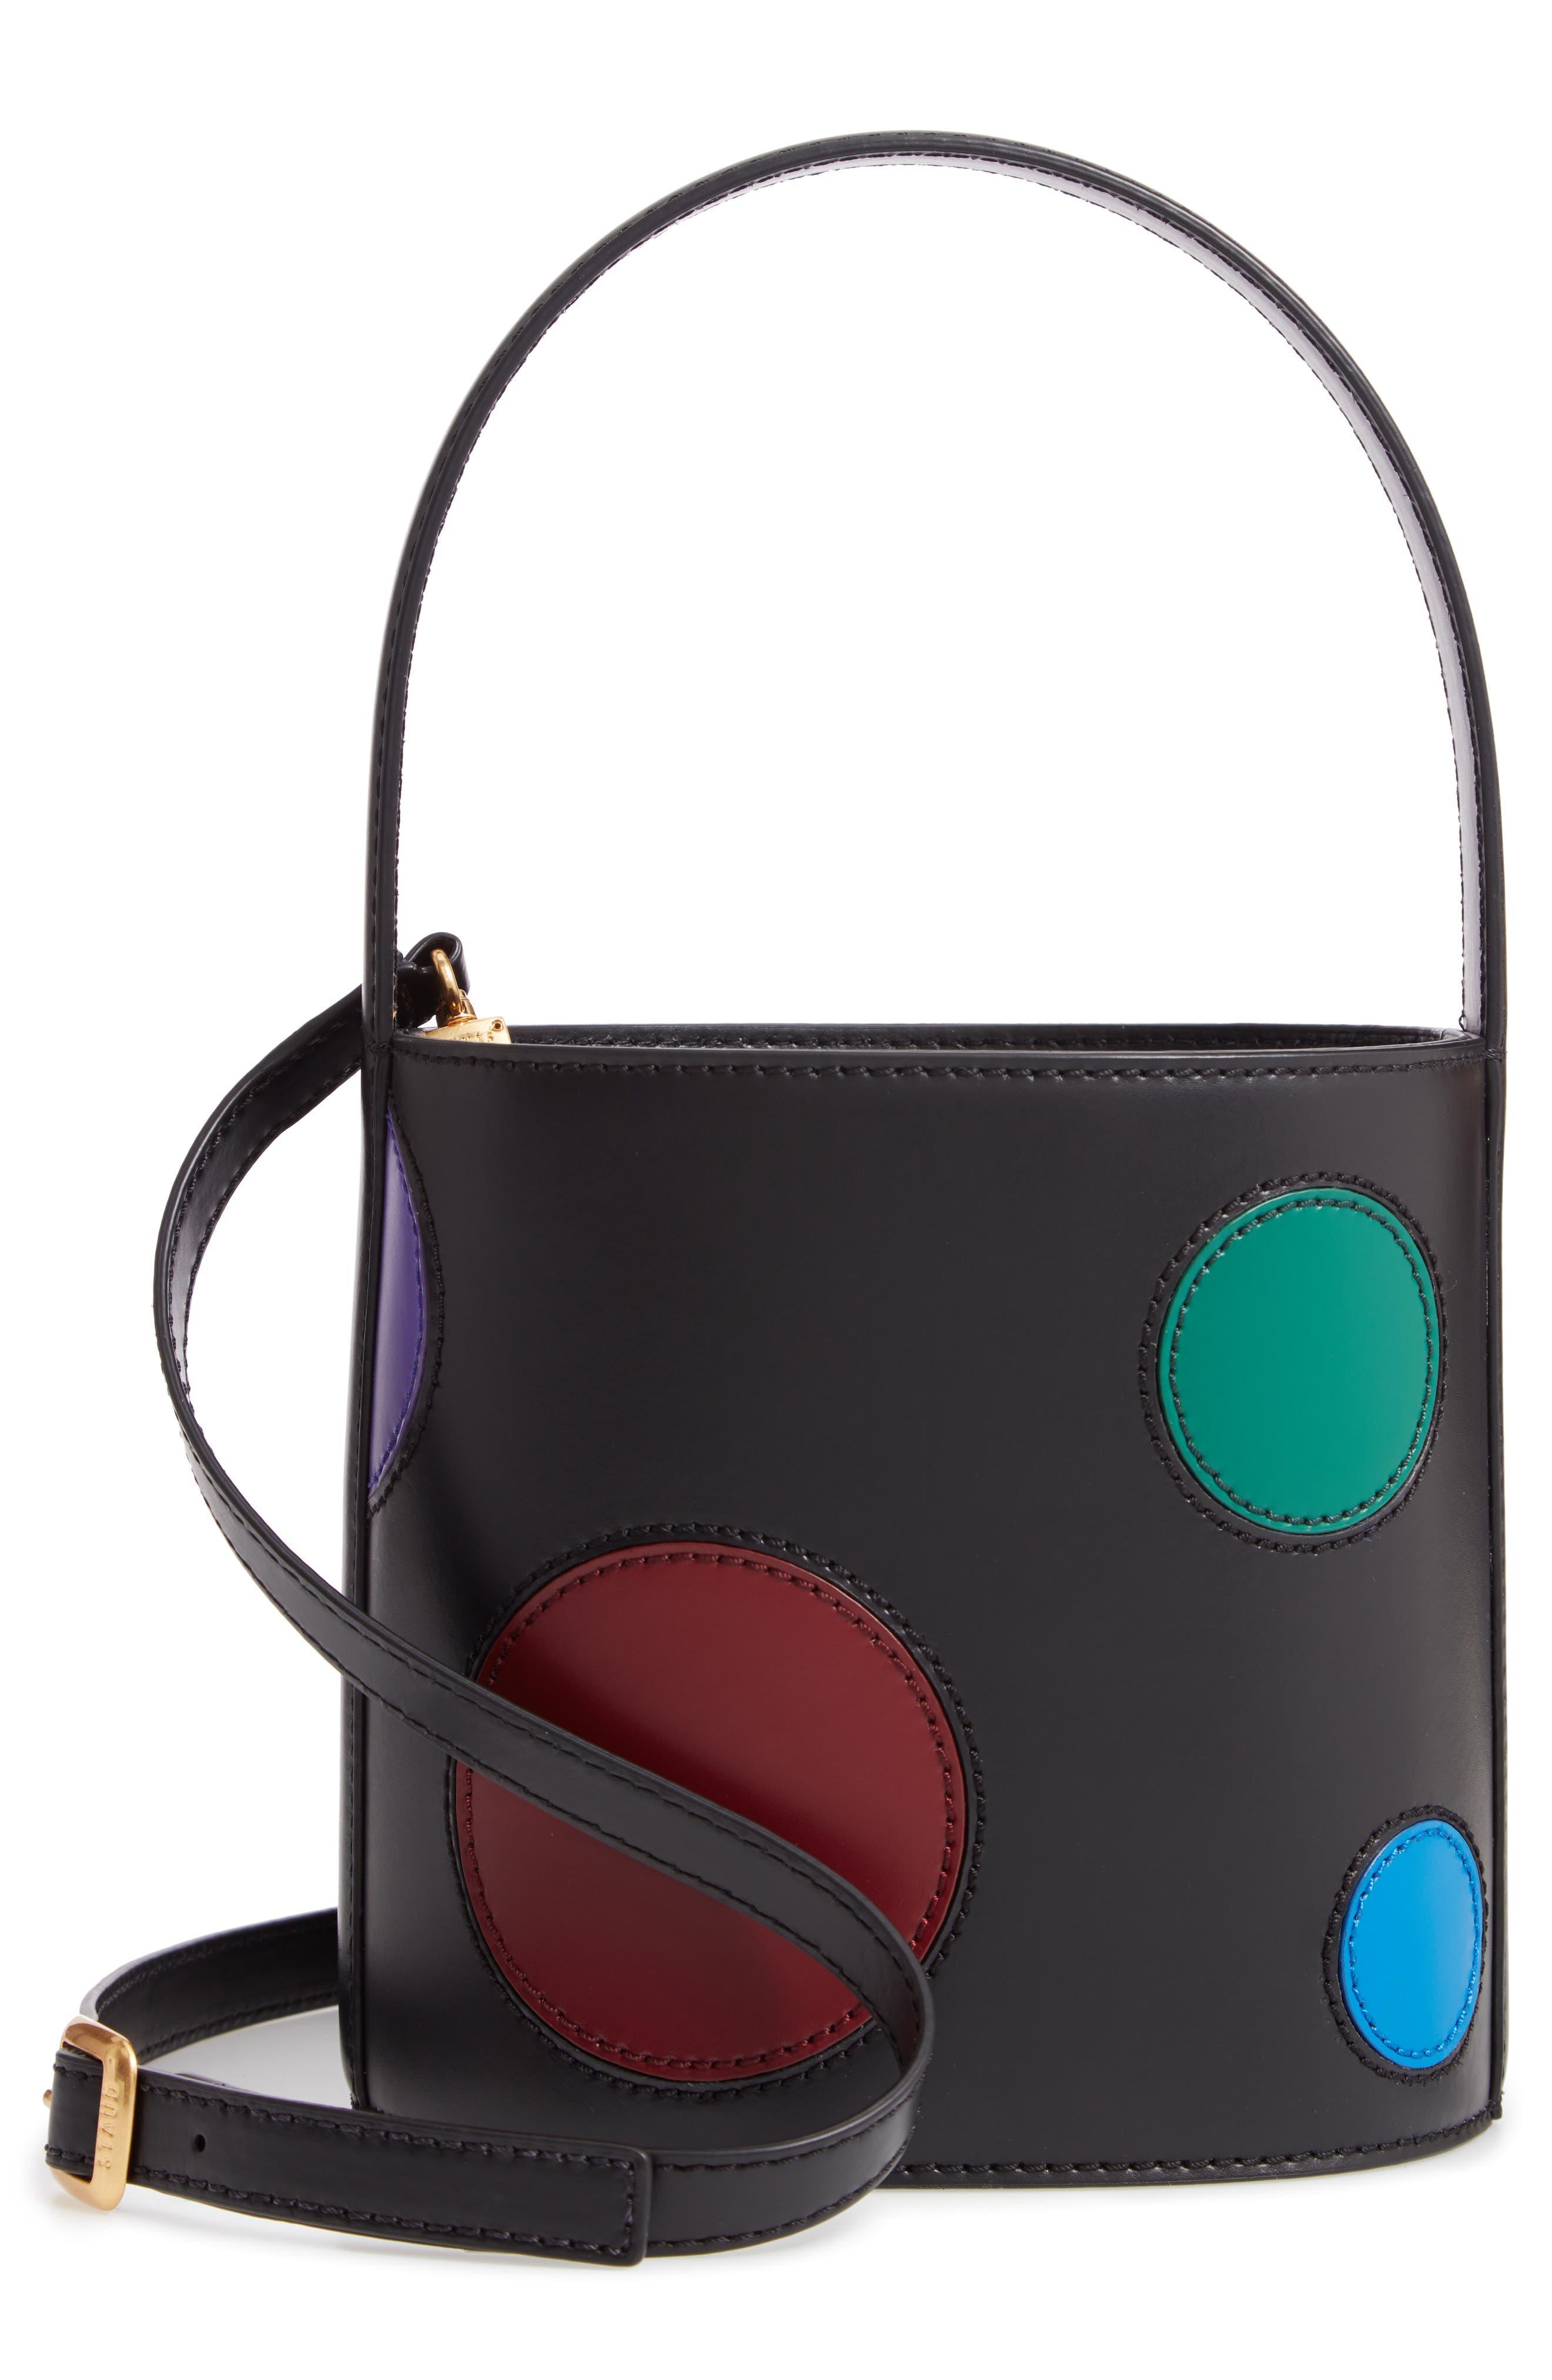 Bissett Dot Leather Bucket Bag - Black in Black/ Multi